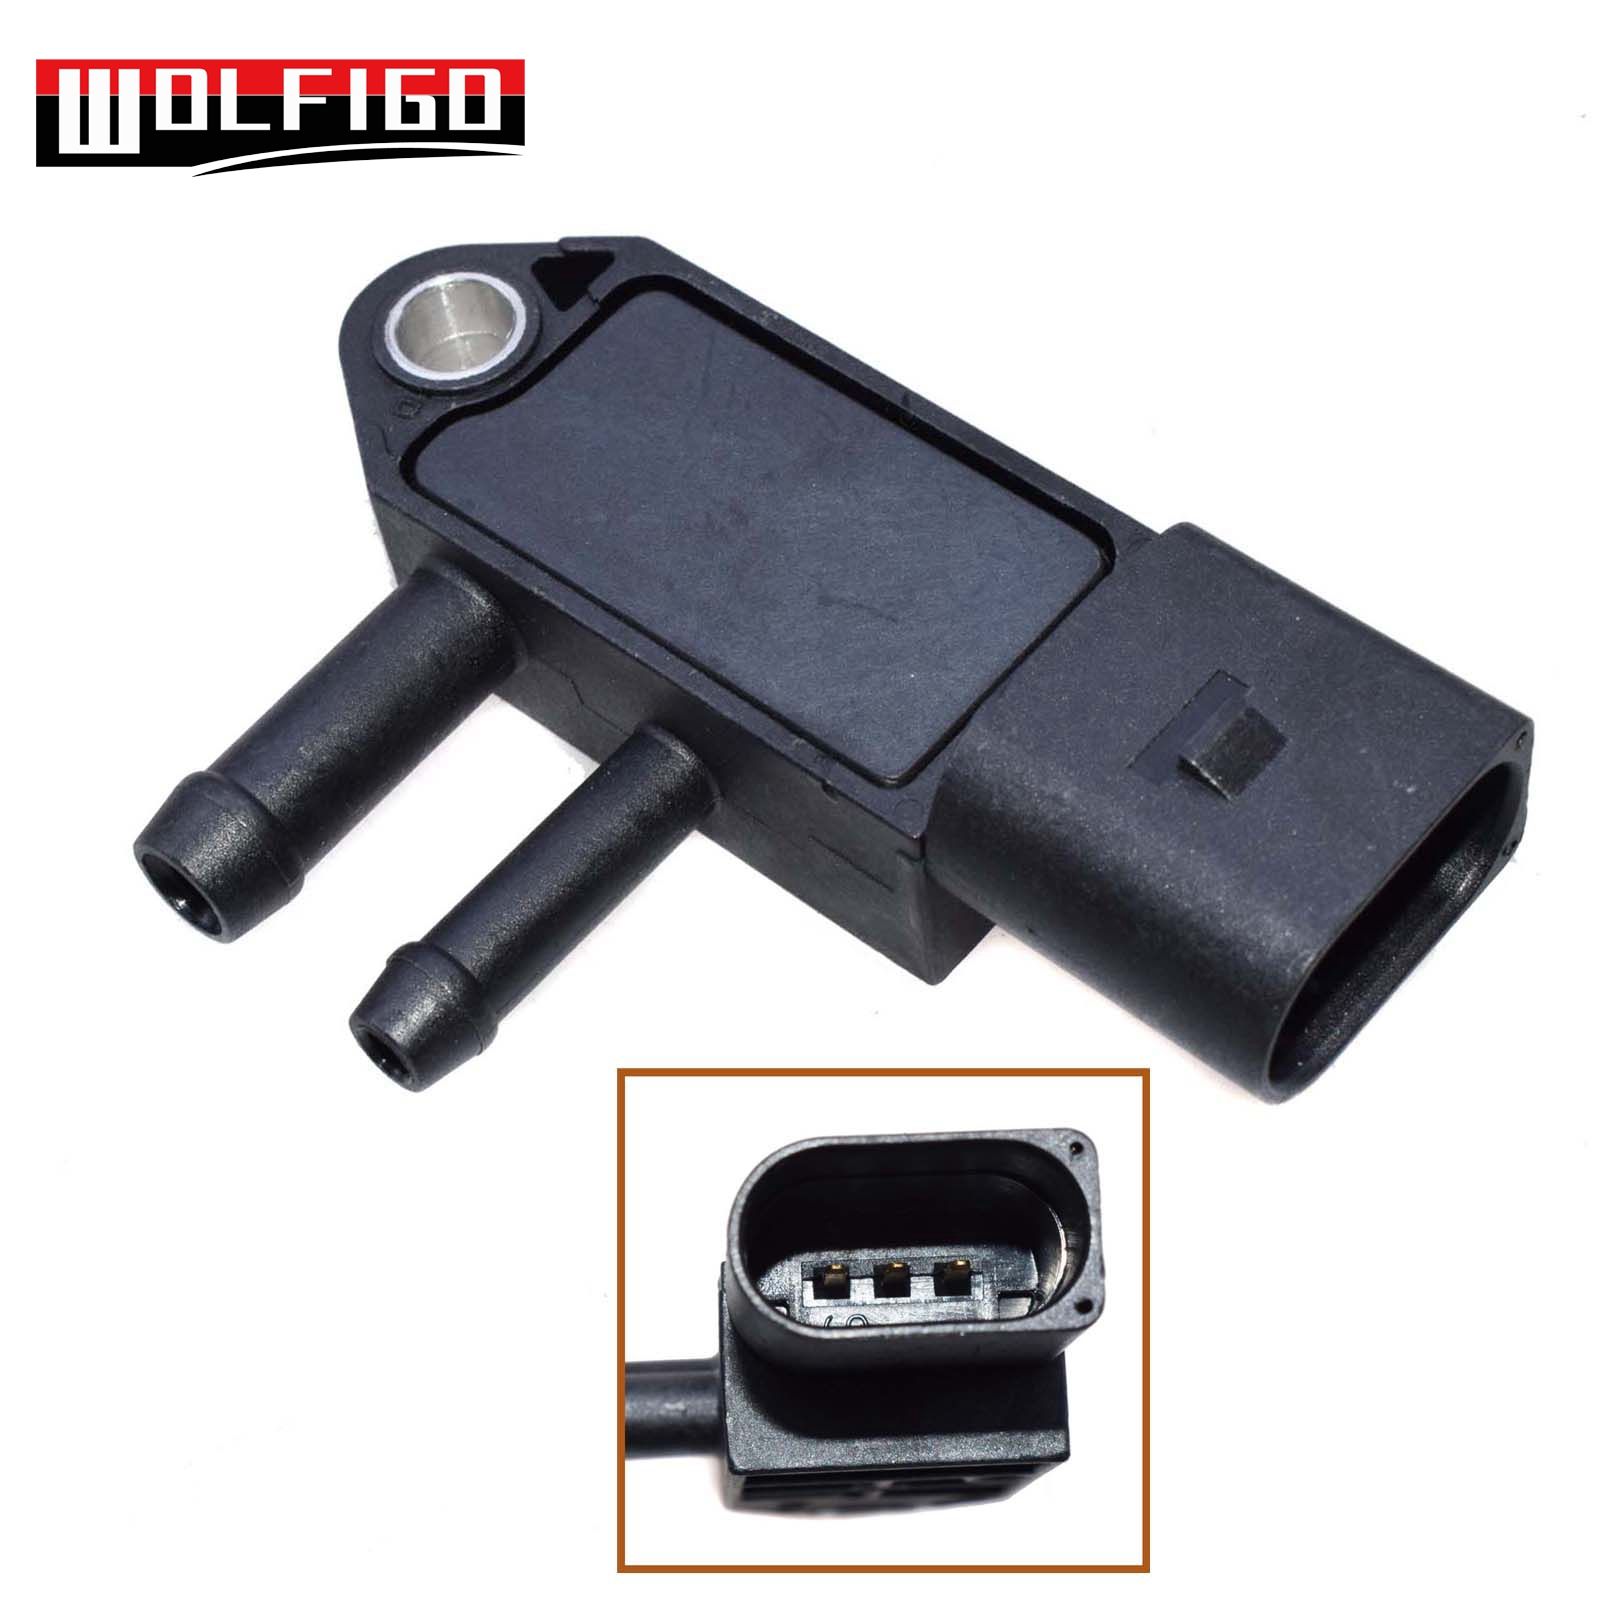 VW Audi Seat Skoda DPF pressure sensor 076906051A 0 281 002 710